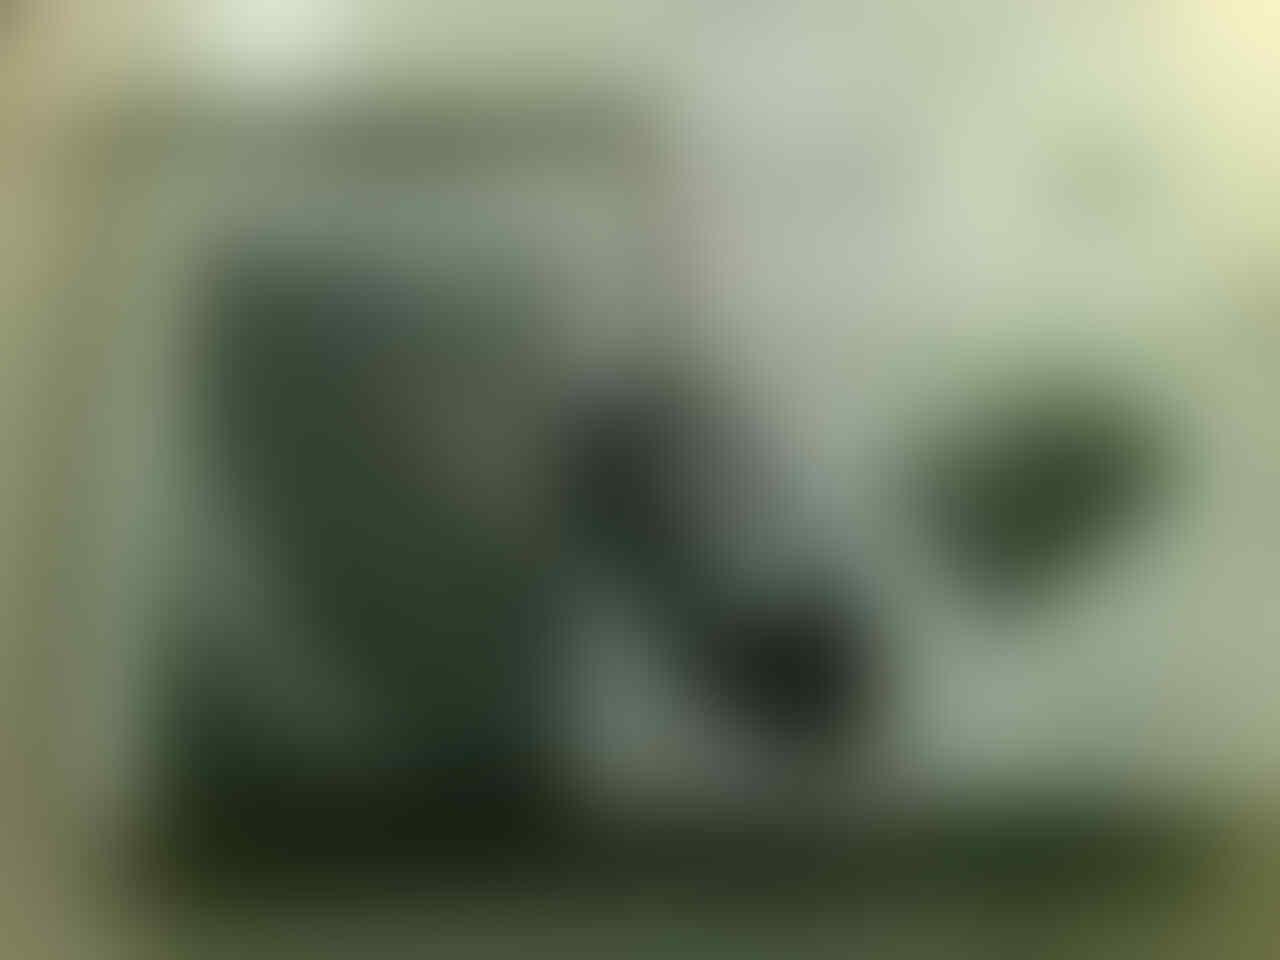 JUAL MURAH HDD EXT SEAGATE EXPANSION 500 GB USB 3.0 FULL ISI COD BANDUNG